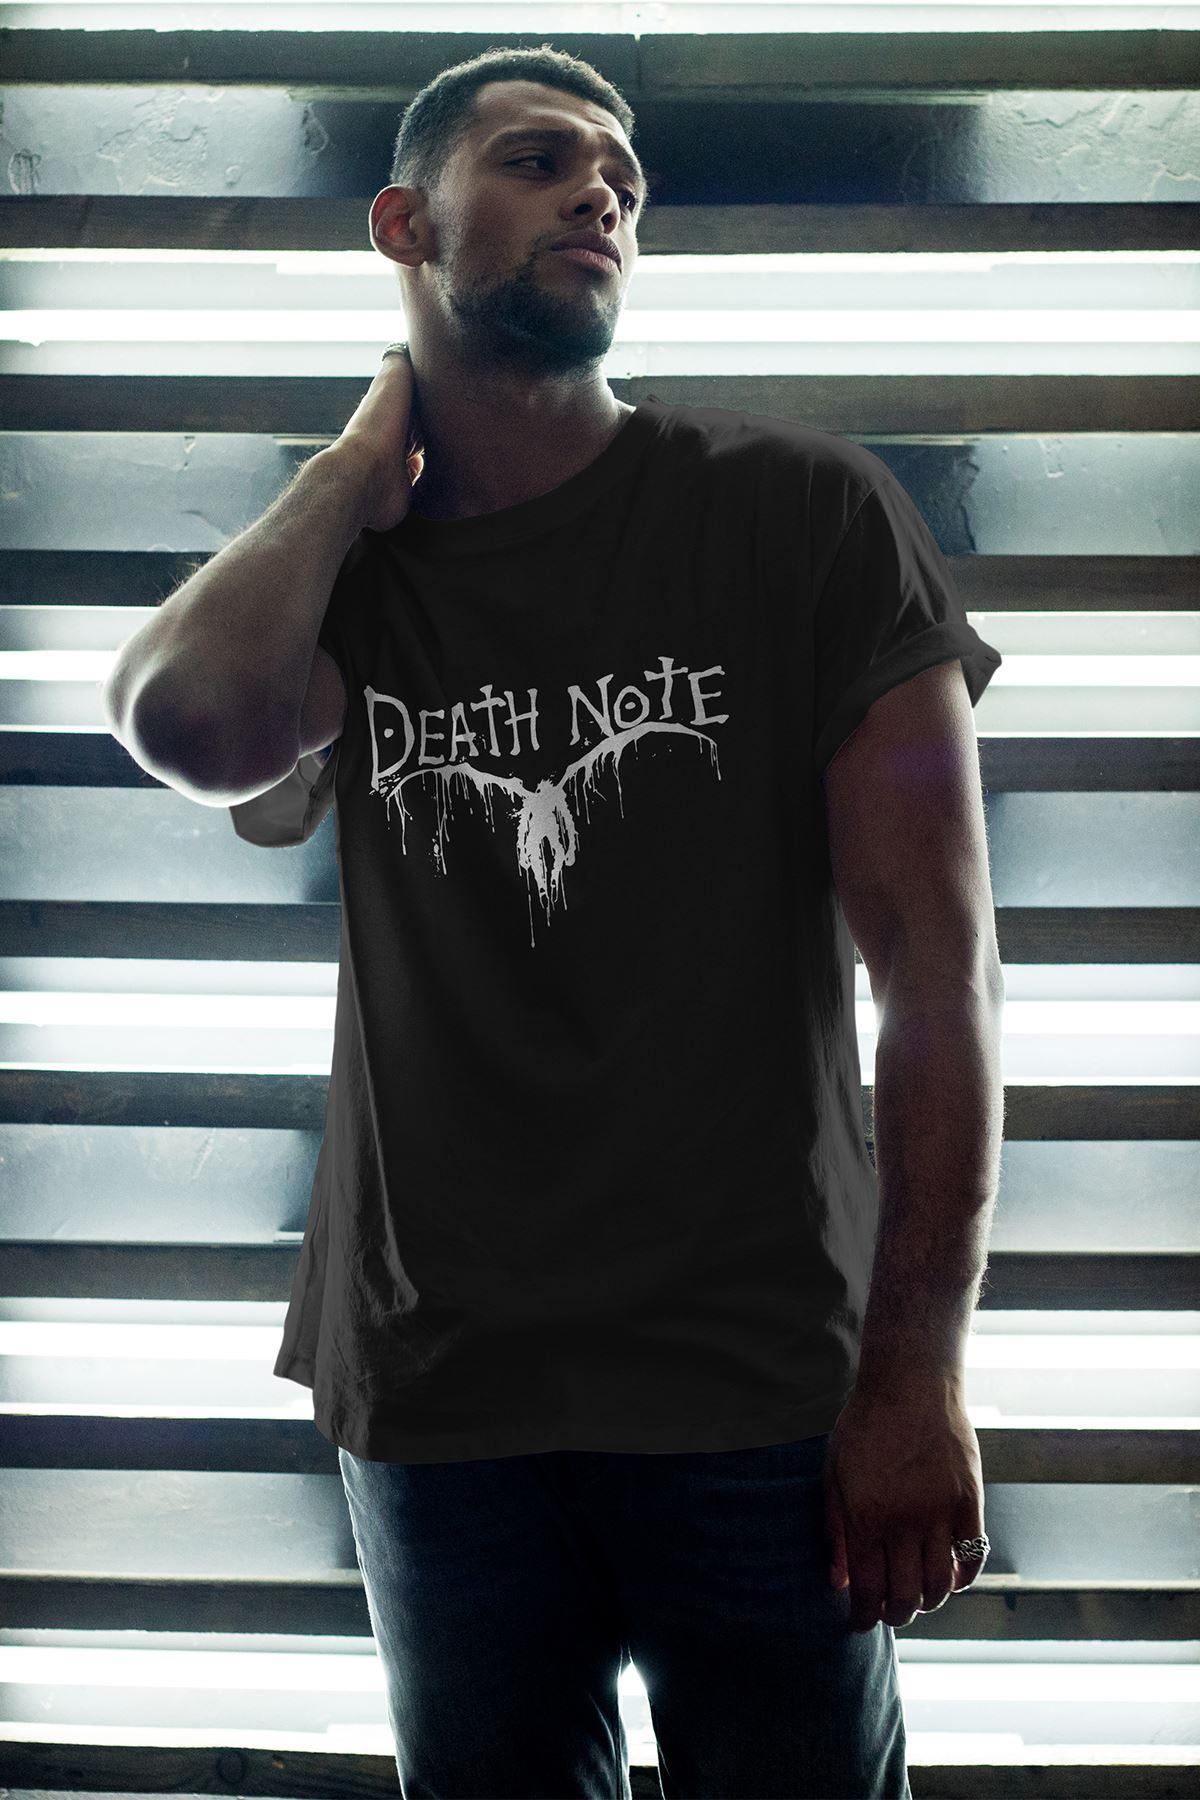 Anime Death Note 06 Siyah Erkek Oversize Tshirt - Tişört